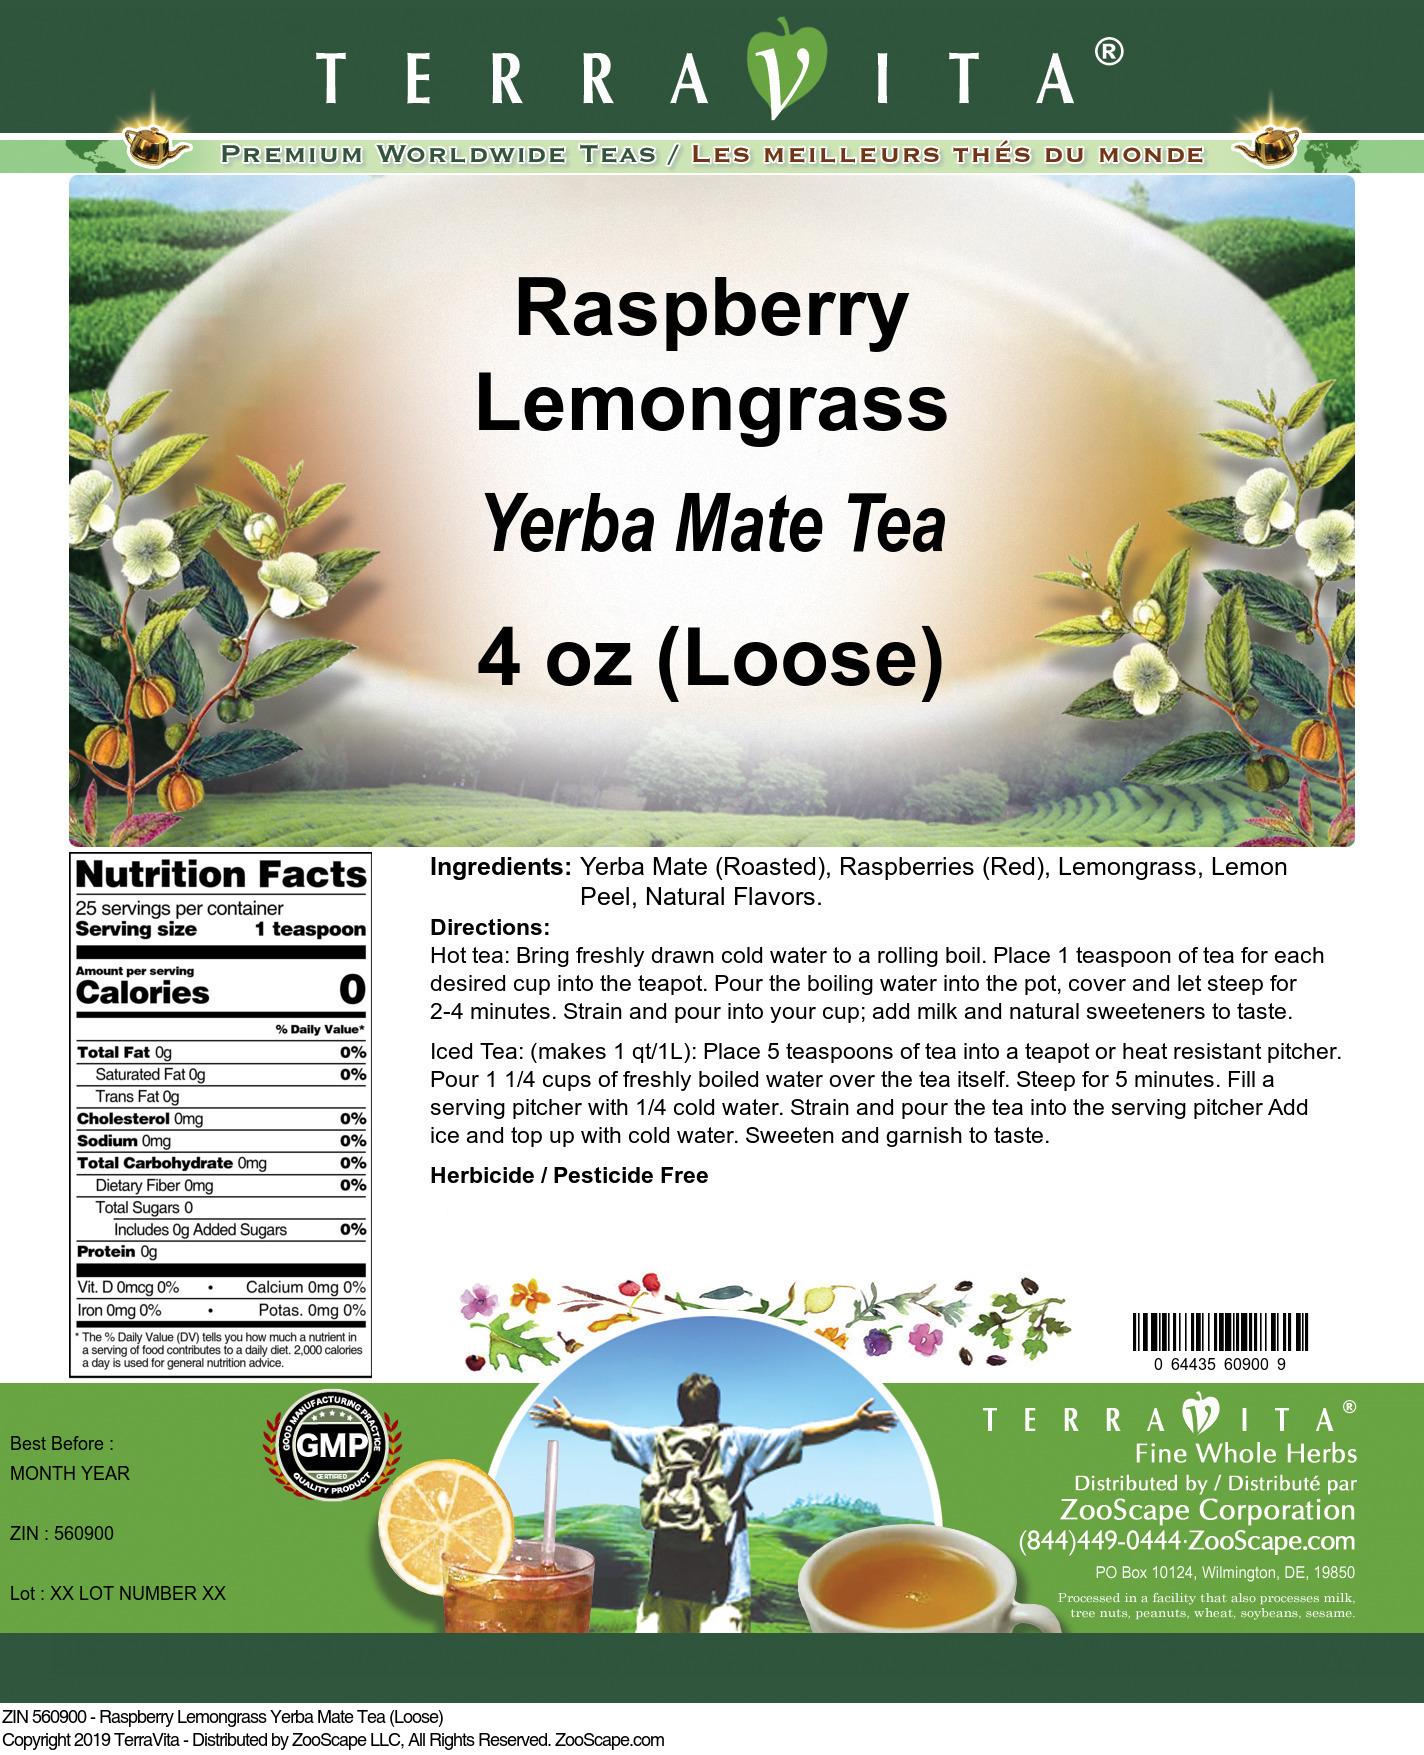 Raspberry Lemongrass Yerba Mate Tea (Loose)